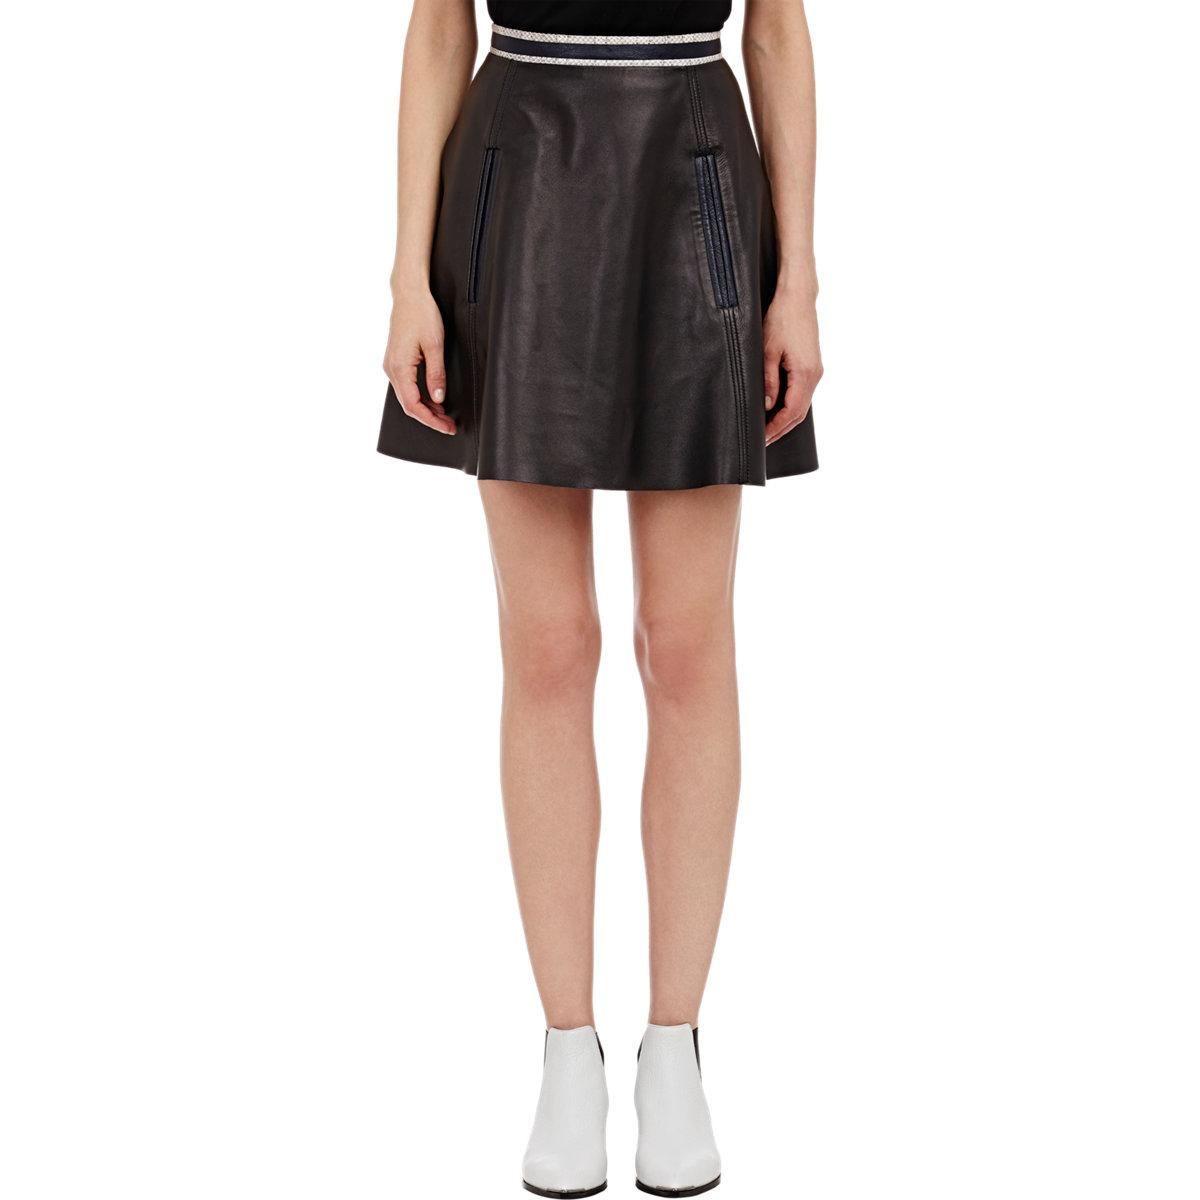 acne studios leather larissa skirt in black lyst